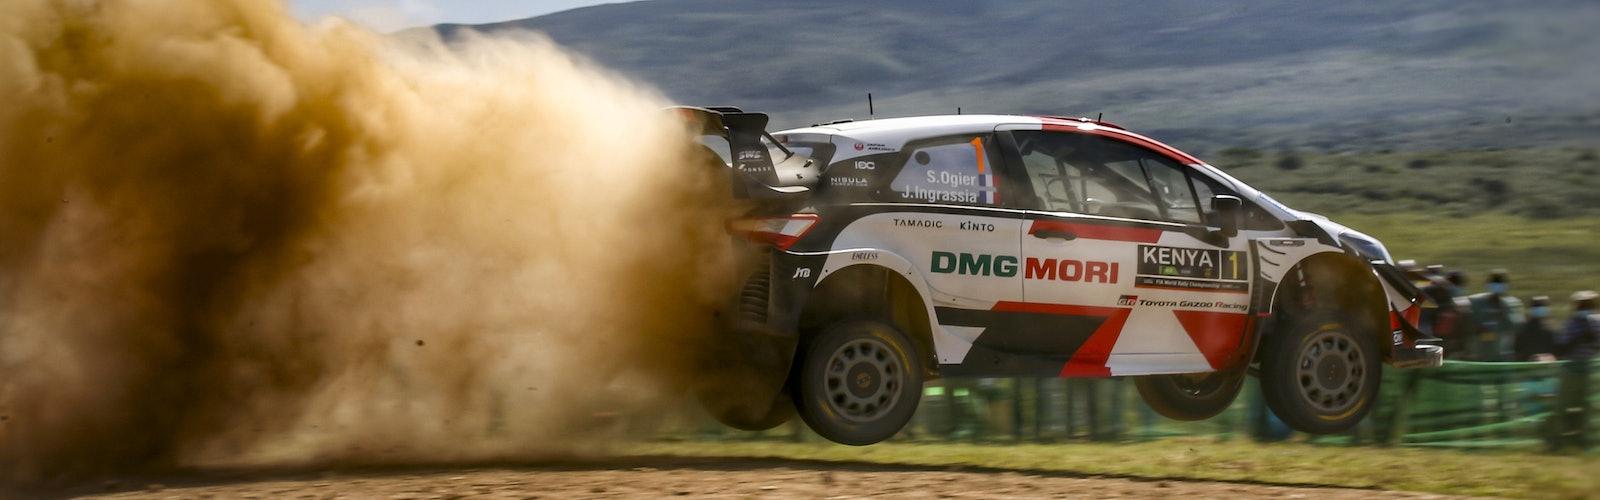 WRC_2021_Rd.6_049